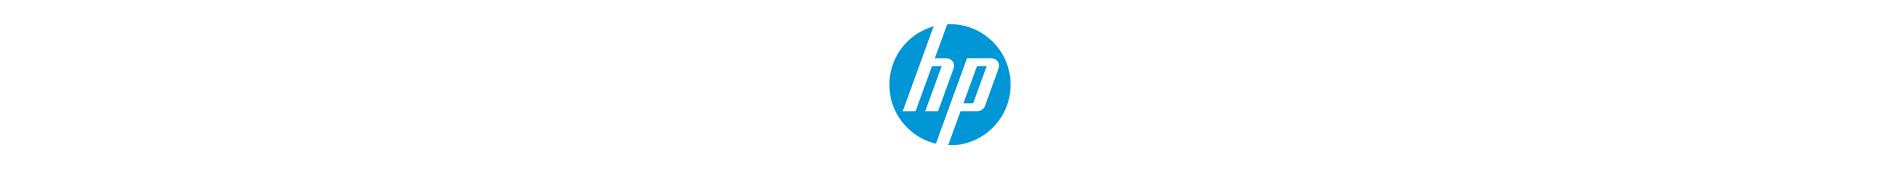 Hp Store Generic Bott Ban